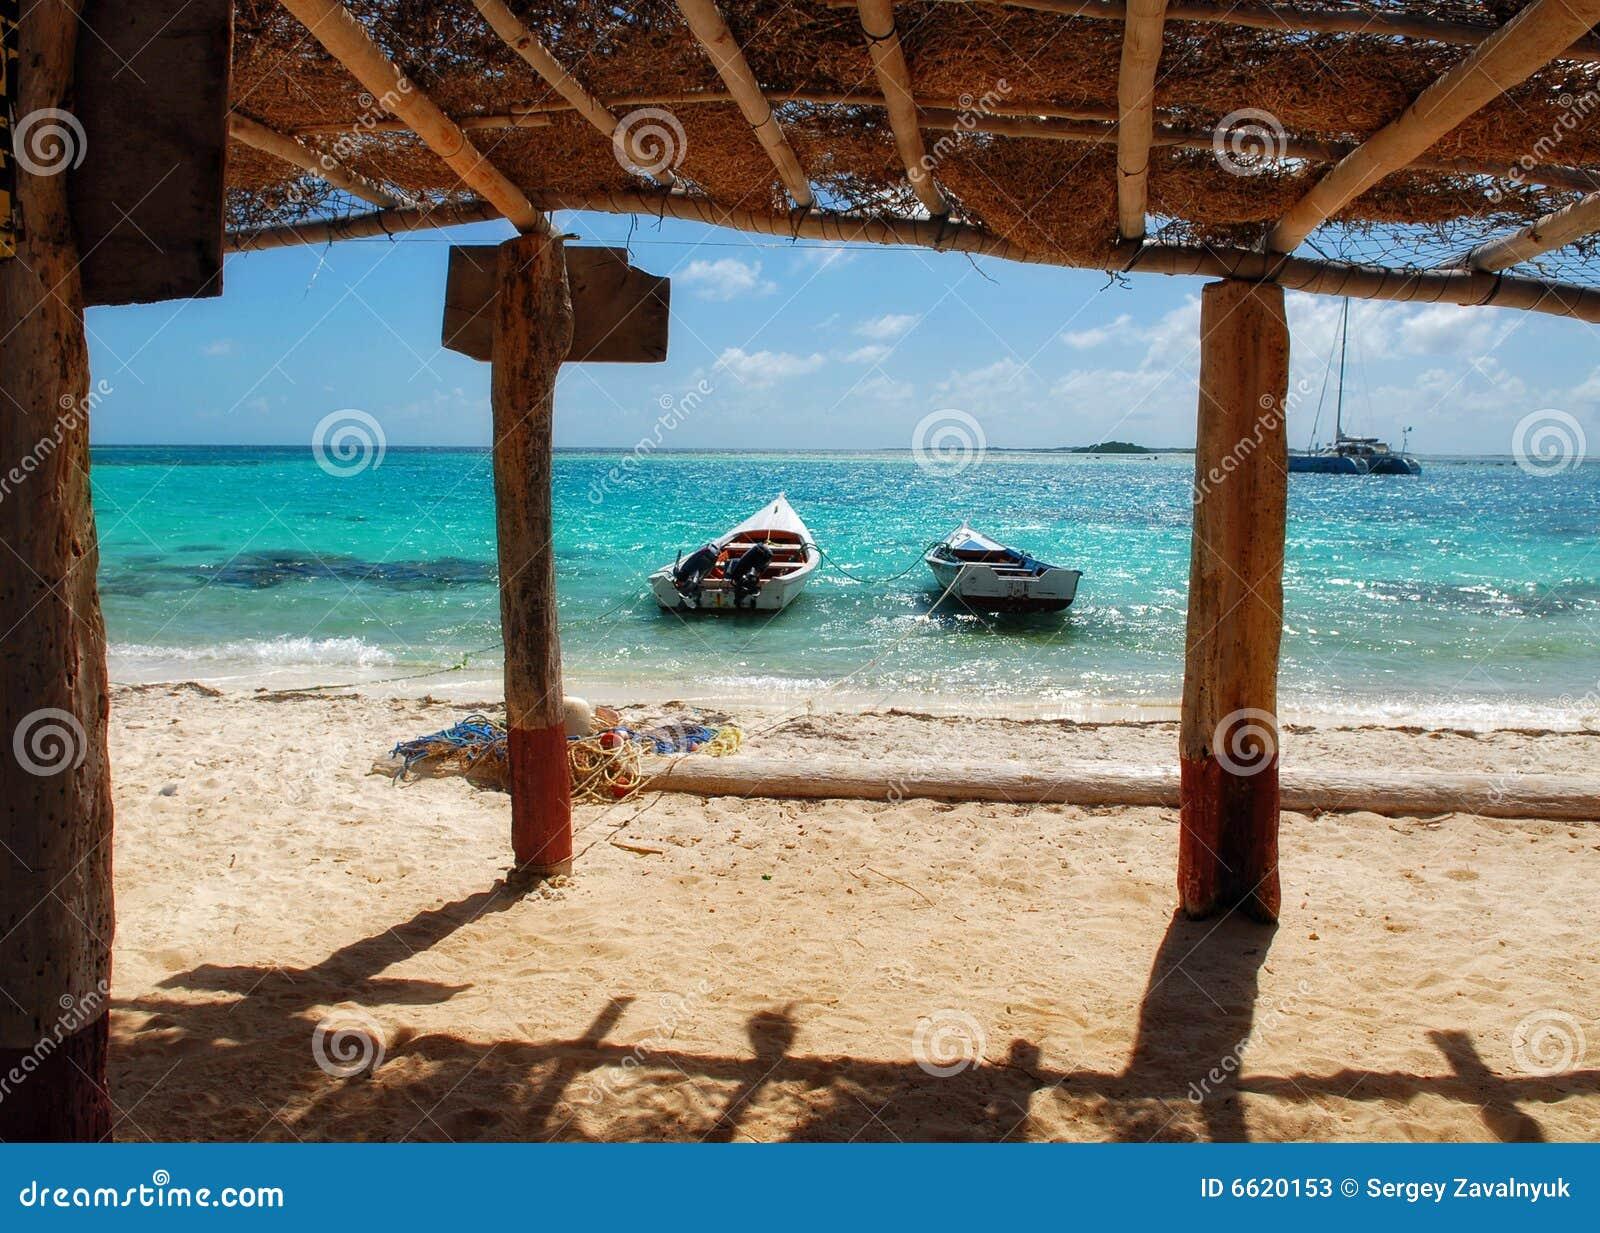 Isla de aves stock photos image 6620153 for Desert island fishing